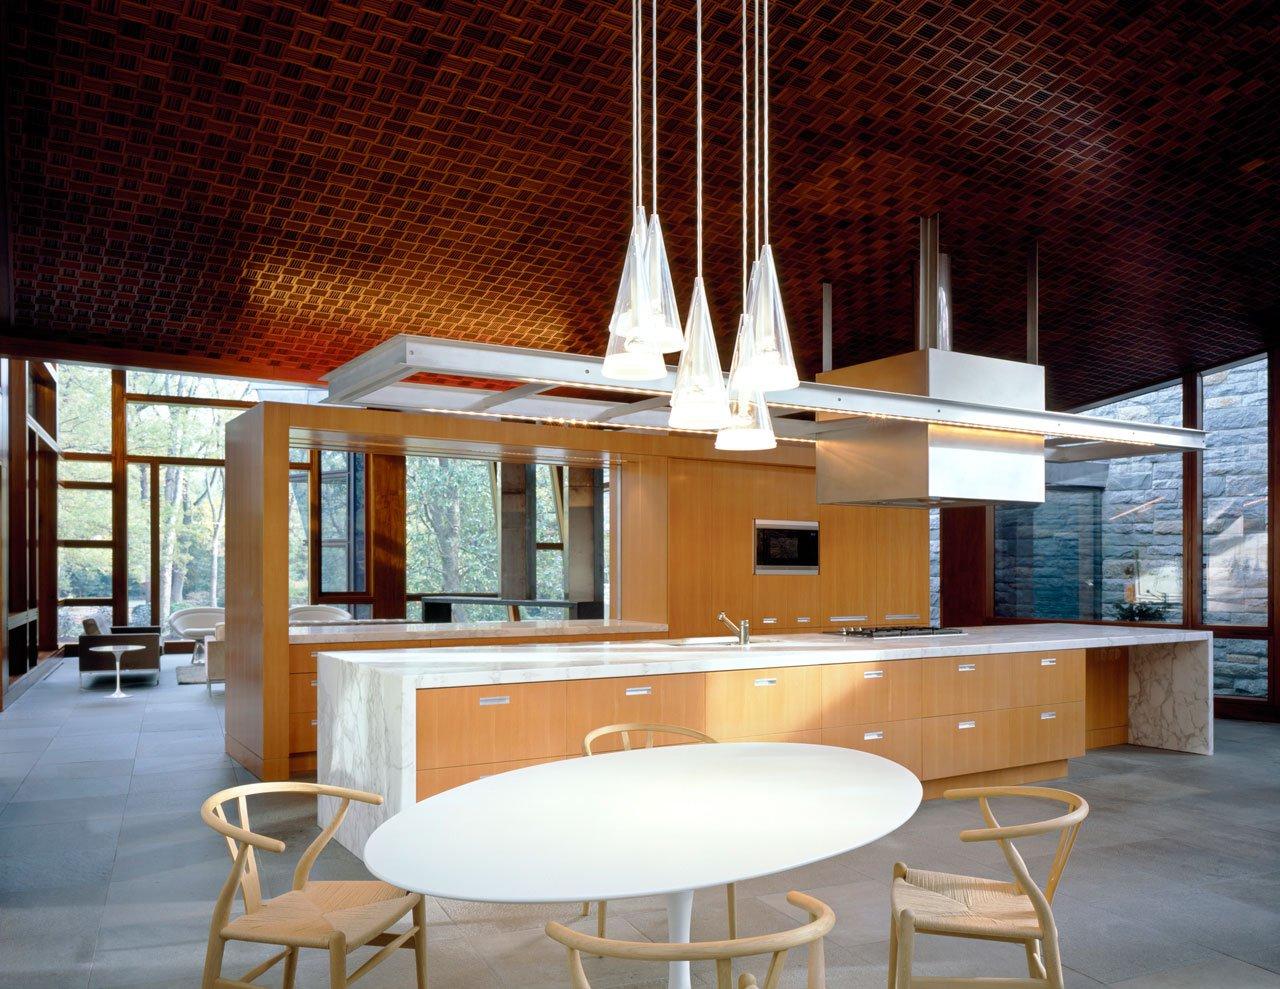 Gleenbrook-Residence-10